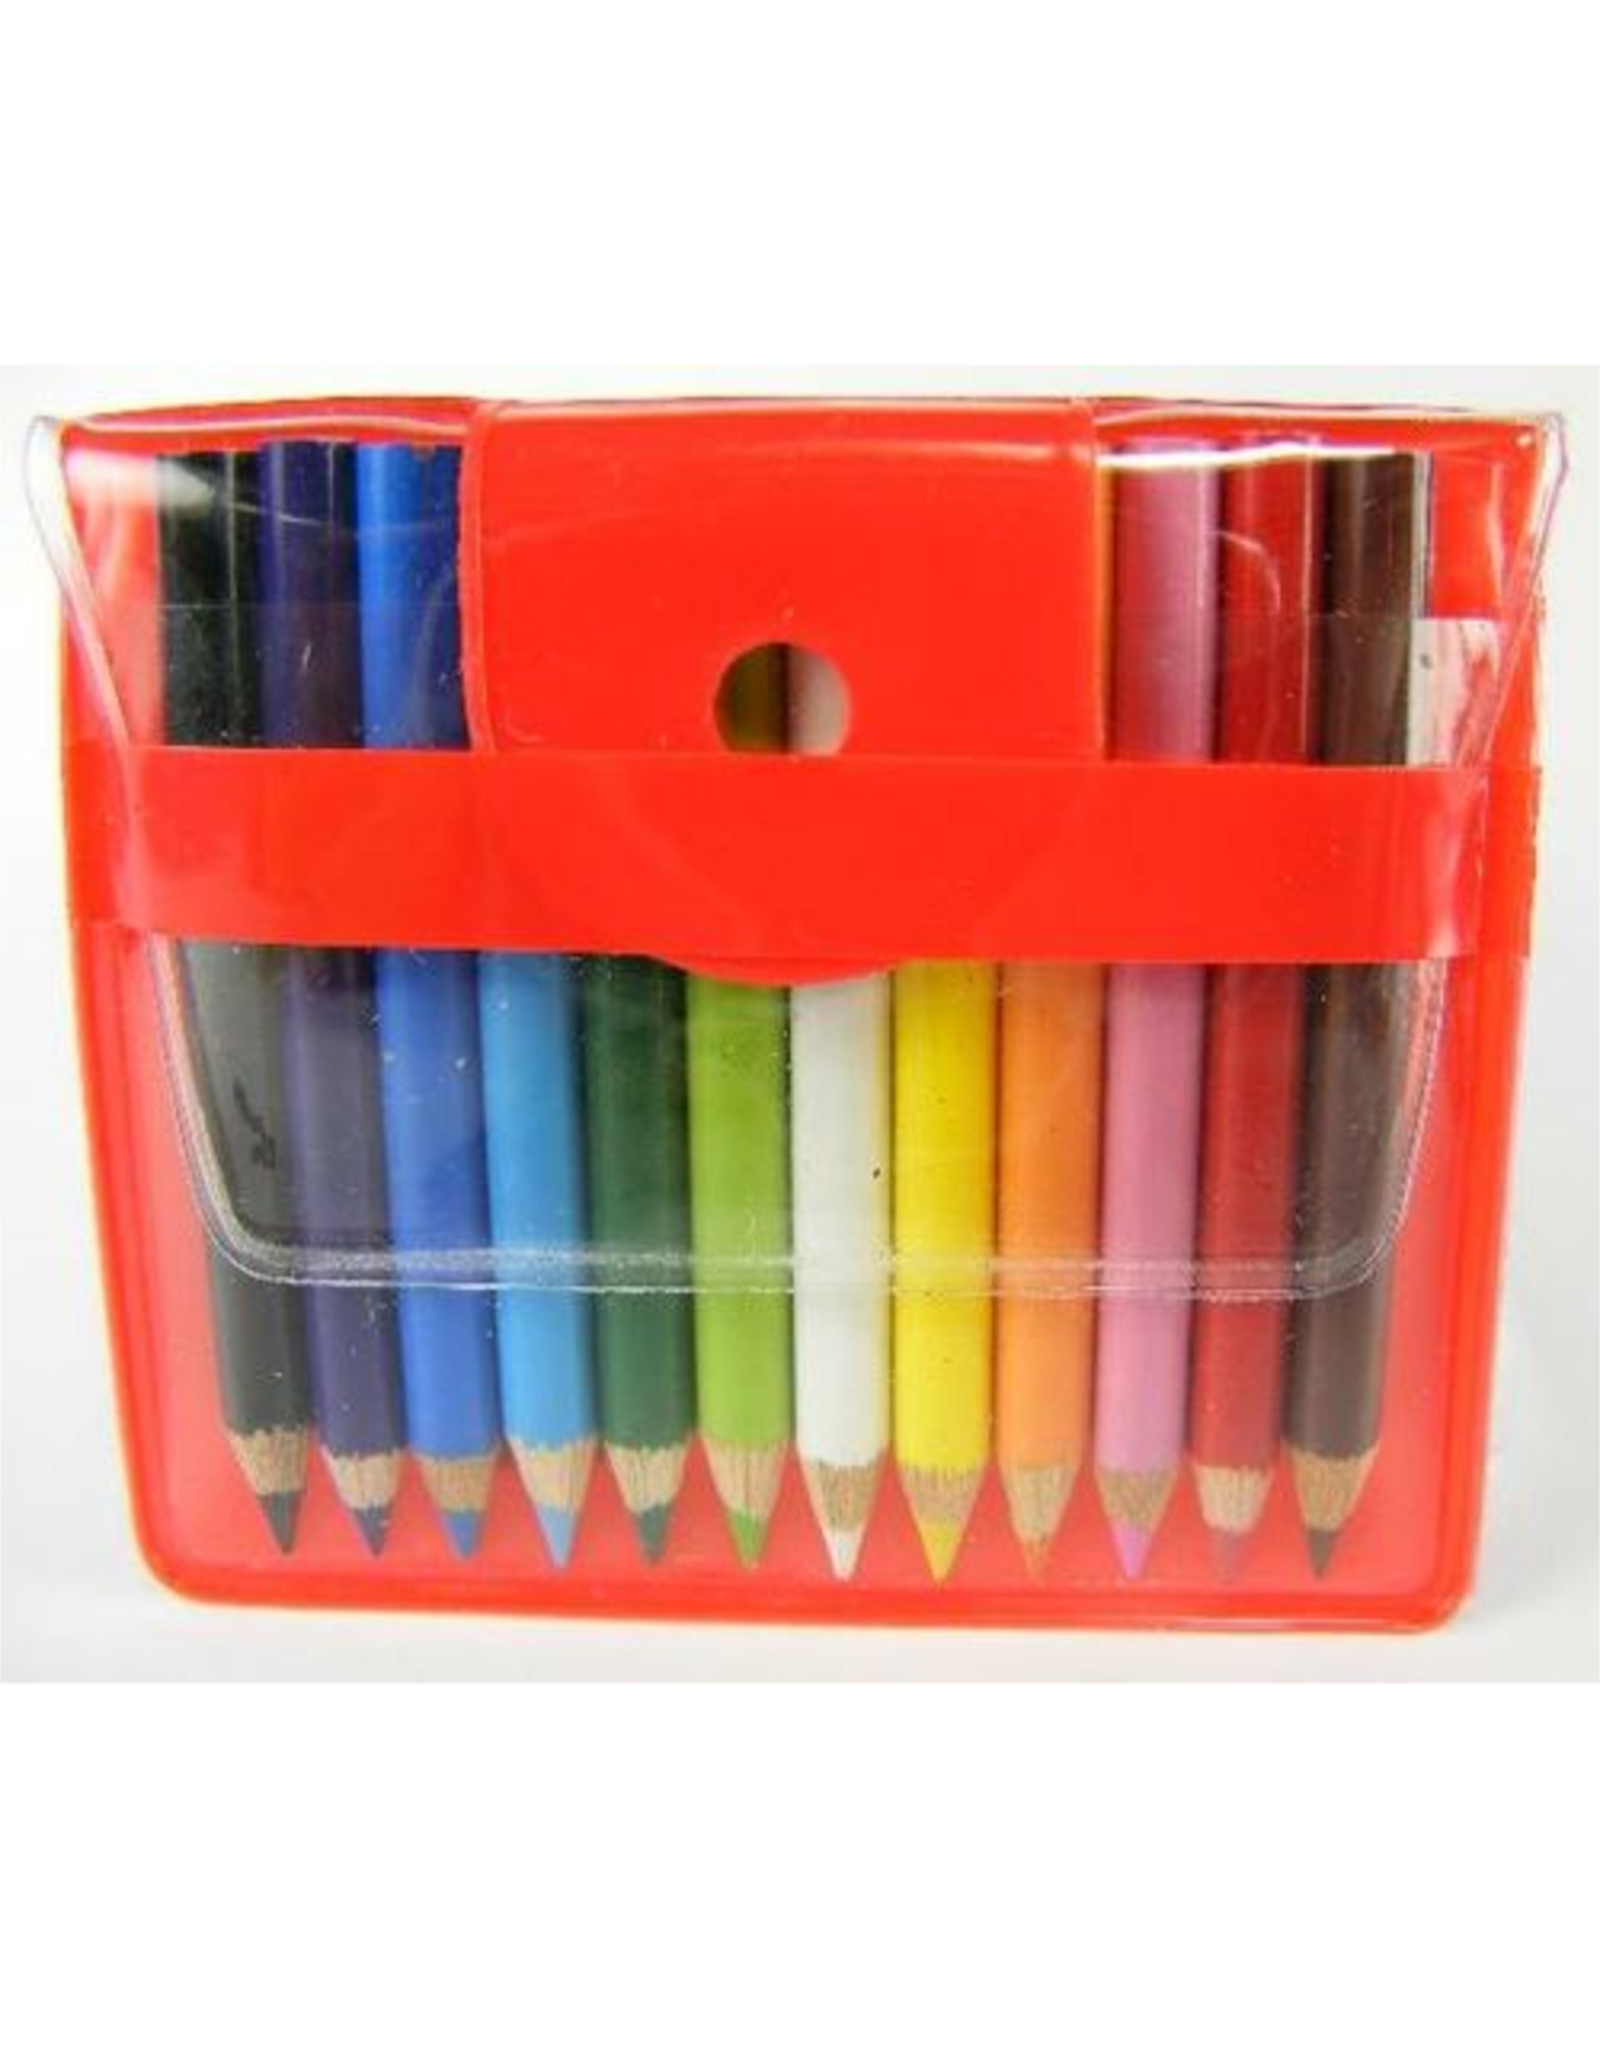 Bcmini Asst Mini pencils in pouch-display-12